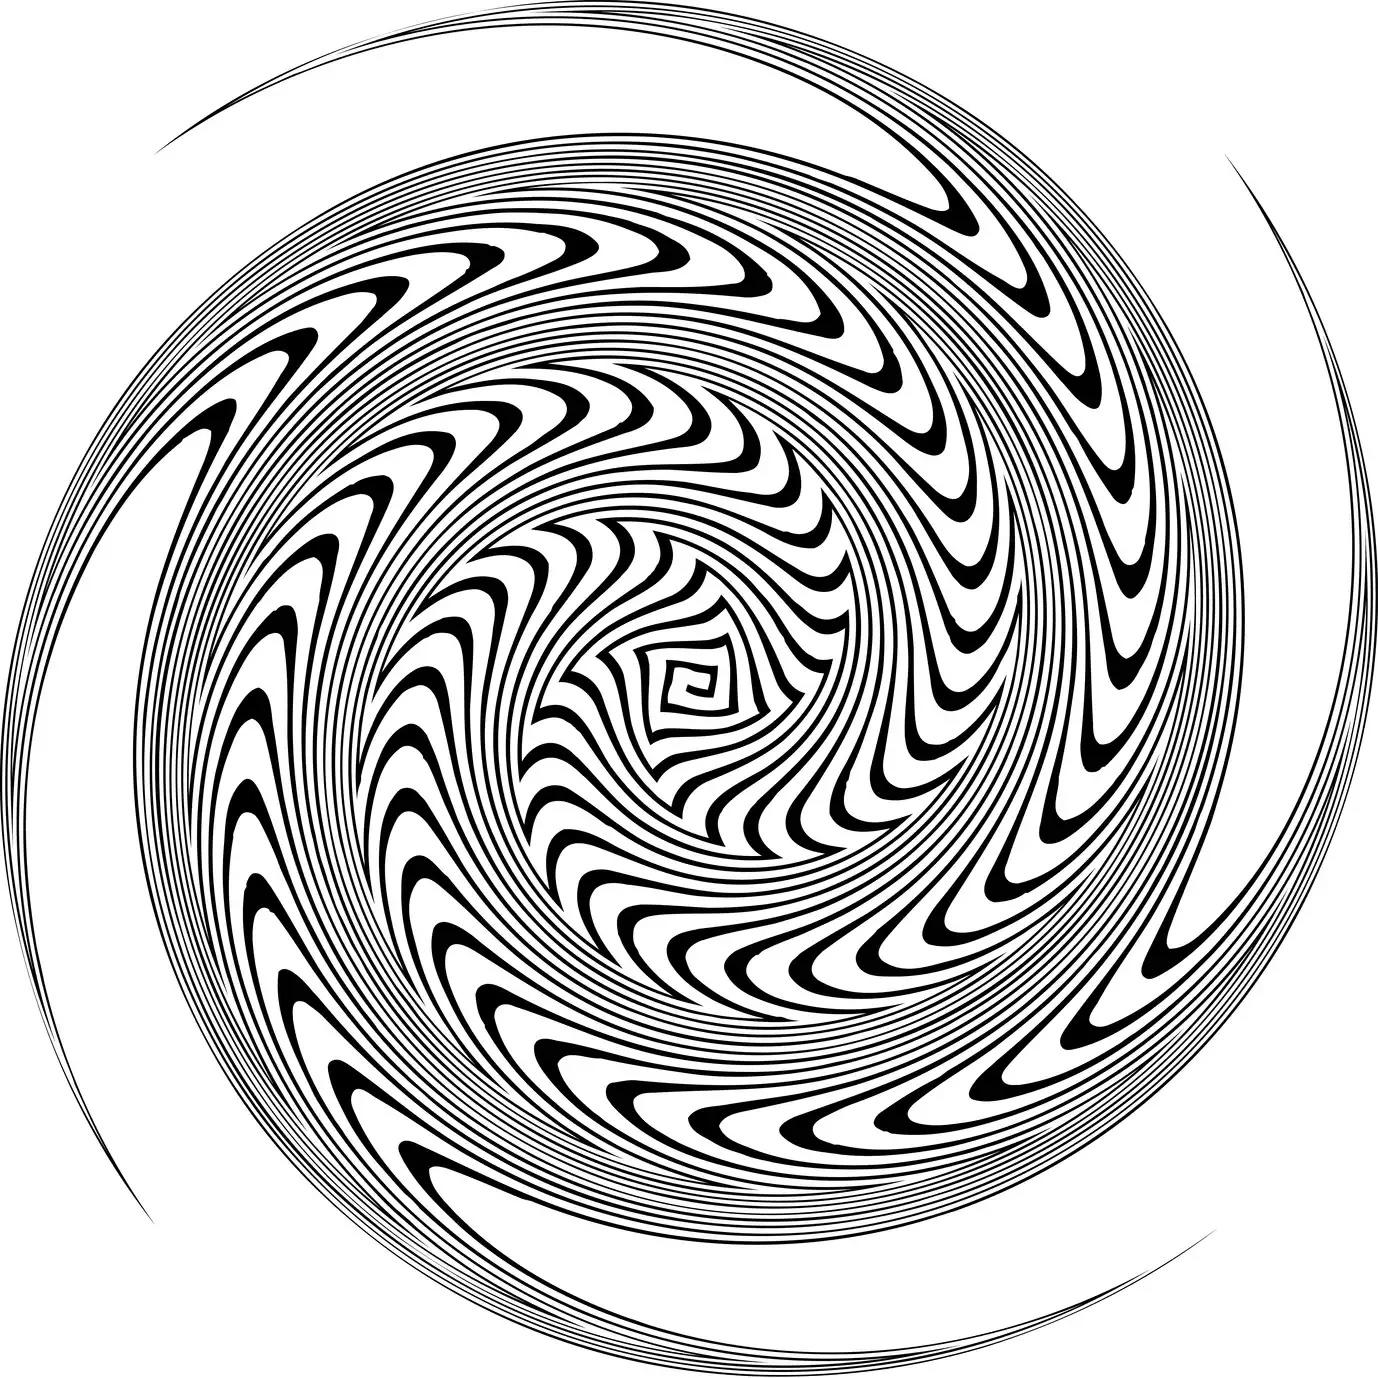 Coloriage Mandala Difficile A Imprimer.Mandala A Colorier Difficile 2 Mandalas Difficiles Pour Adultes